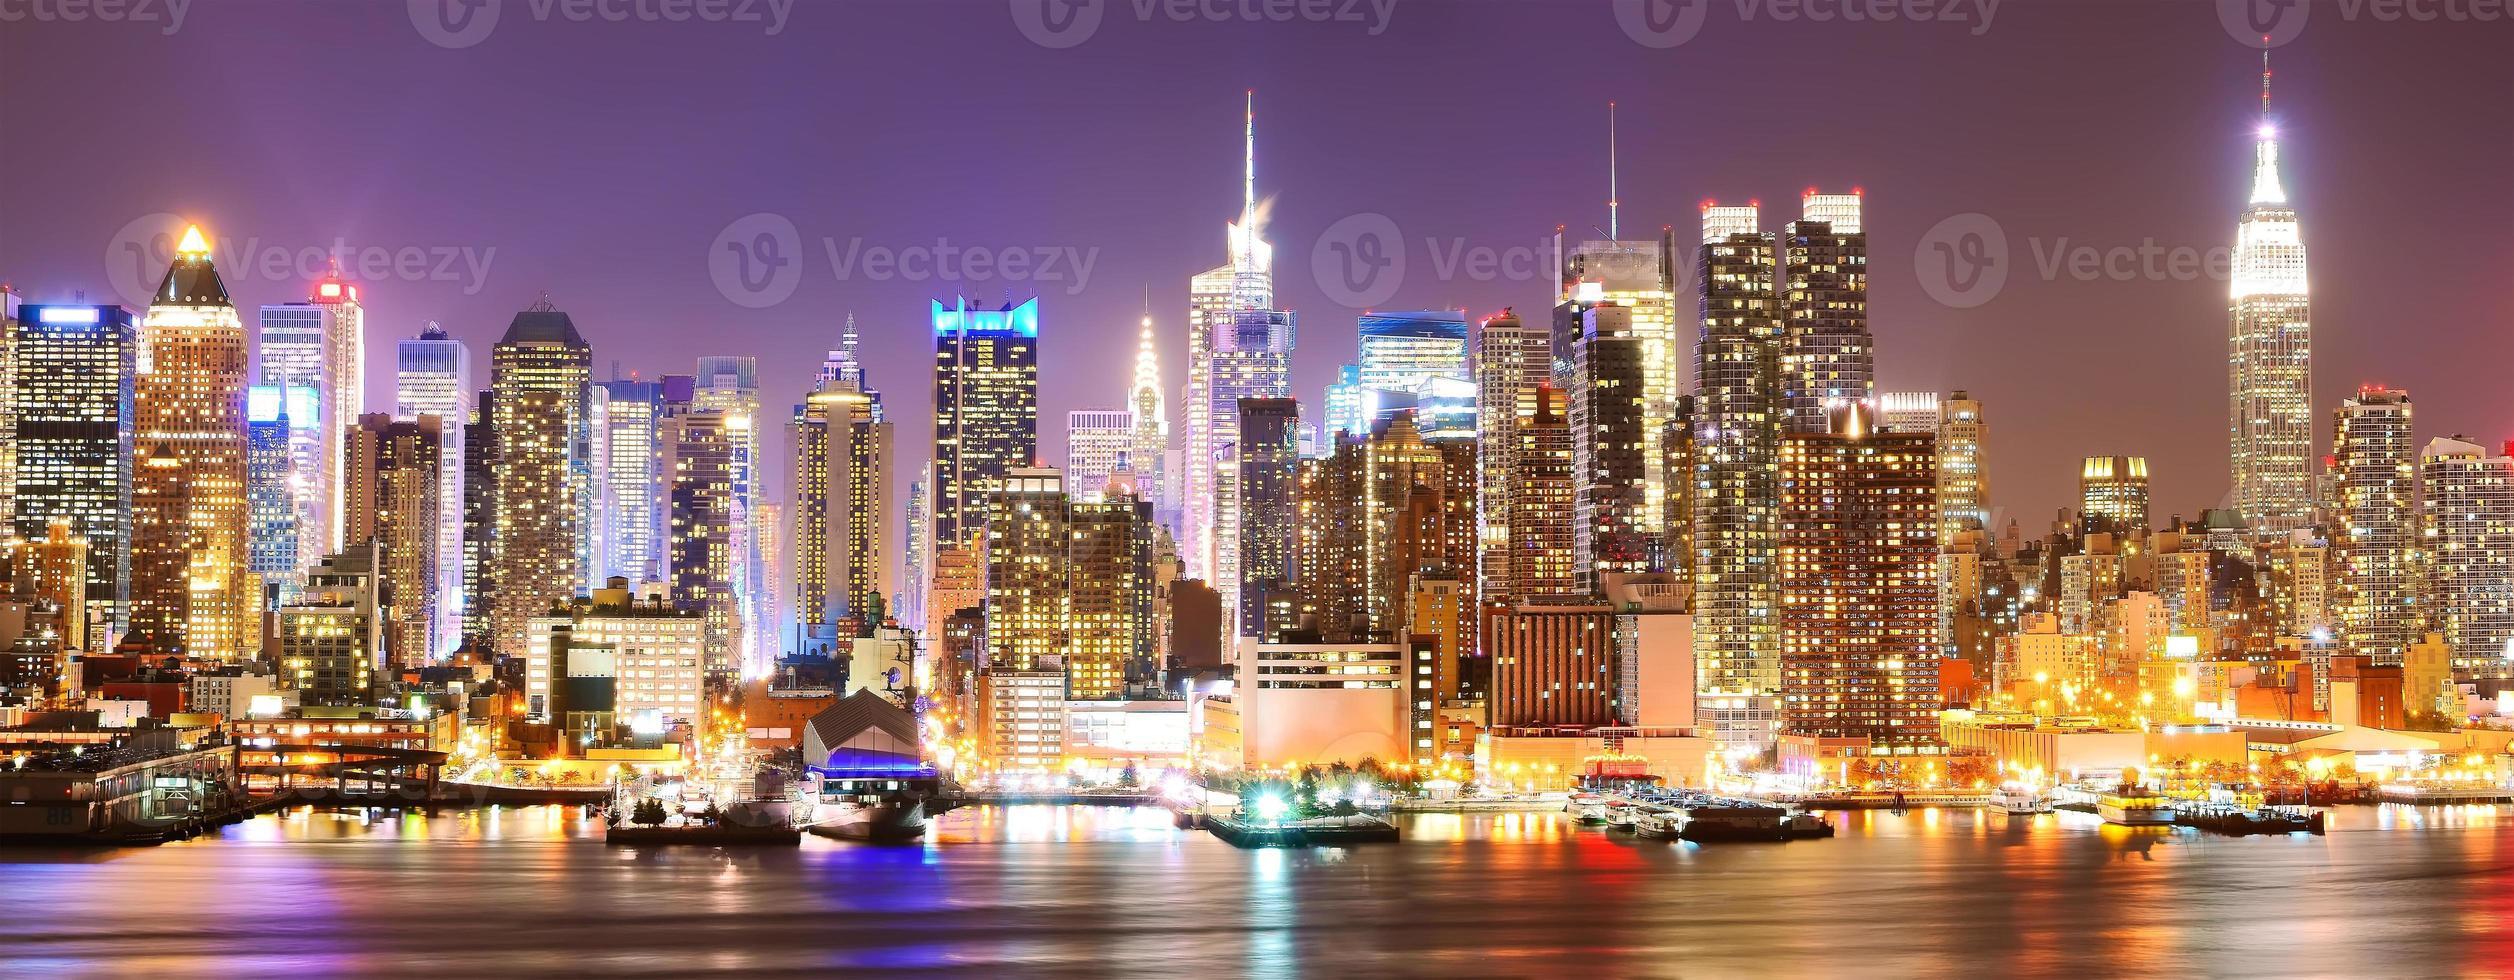 Manhattan skyline at night photo